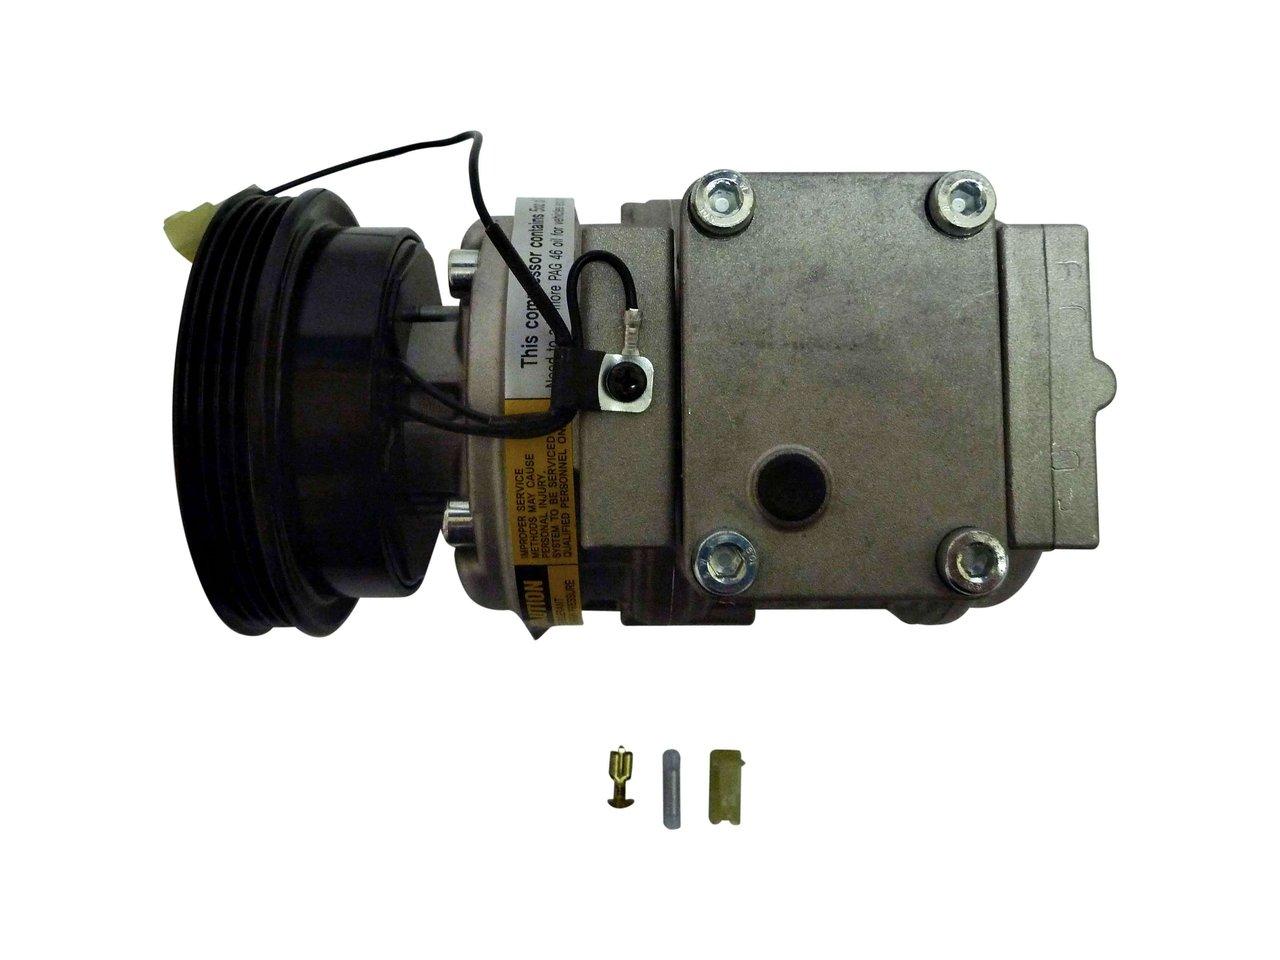 AC Compressor suitable for Landcruiser HDJ78 HDJ79 HDJ100 HZJ105